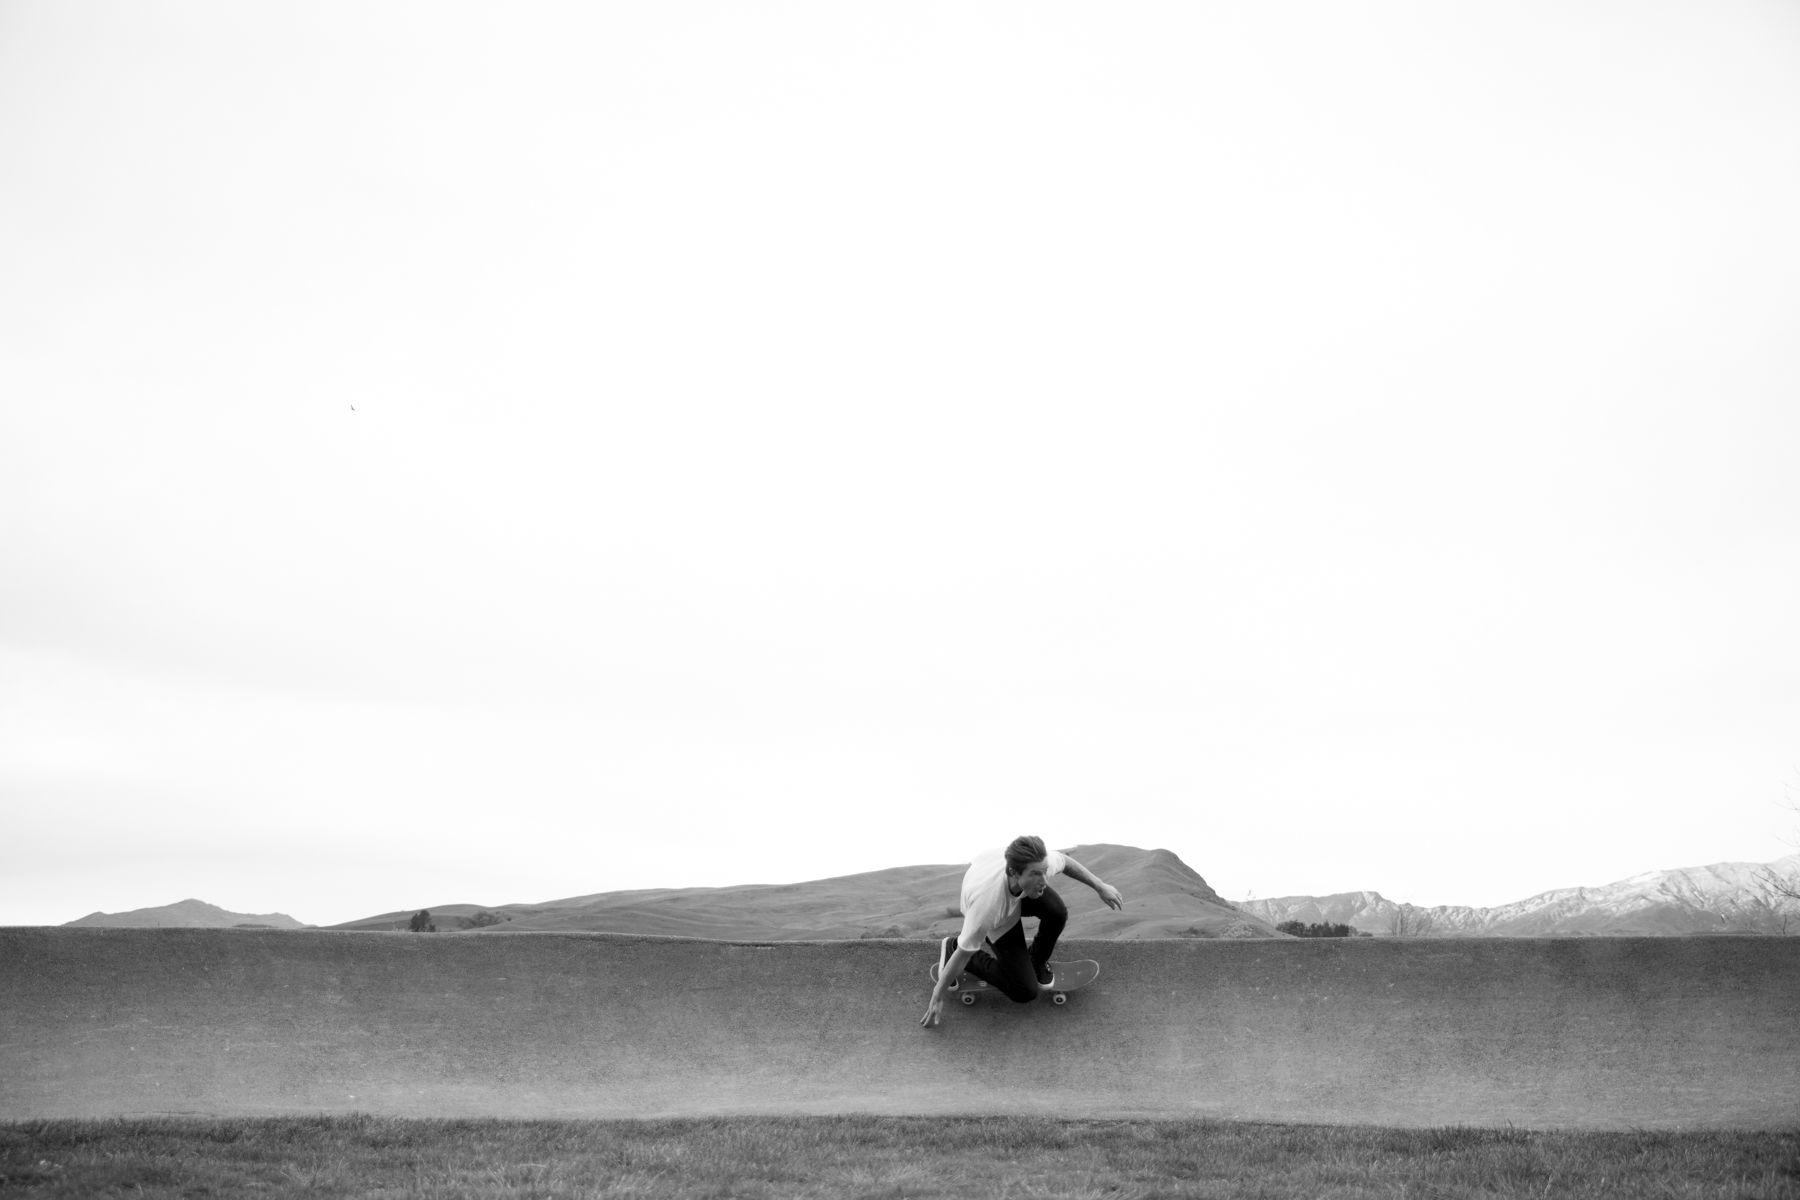 Shaun White, Berm